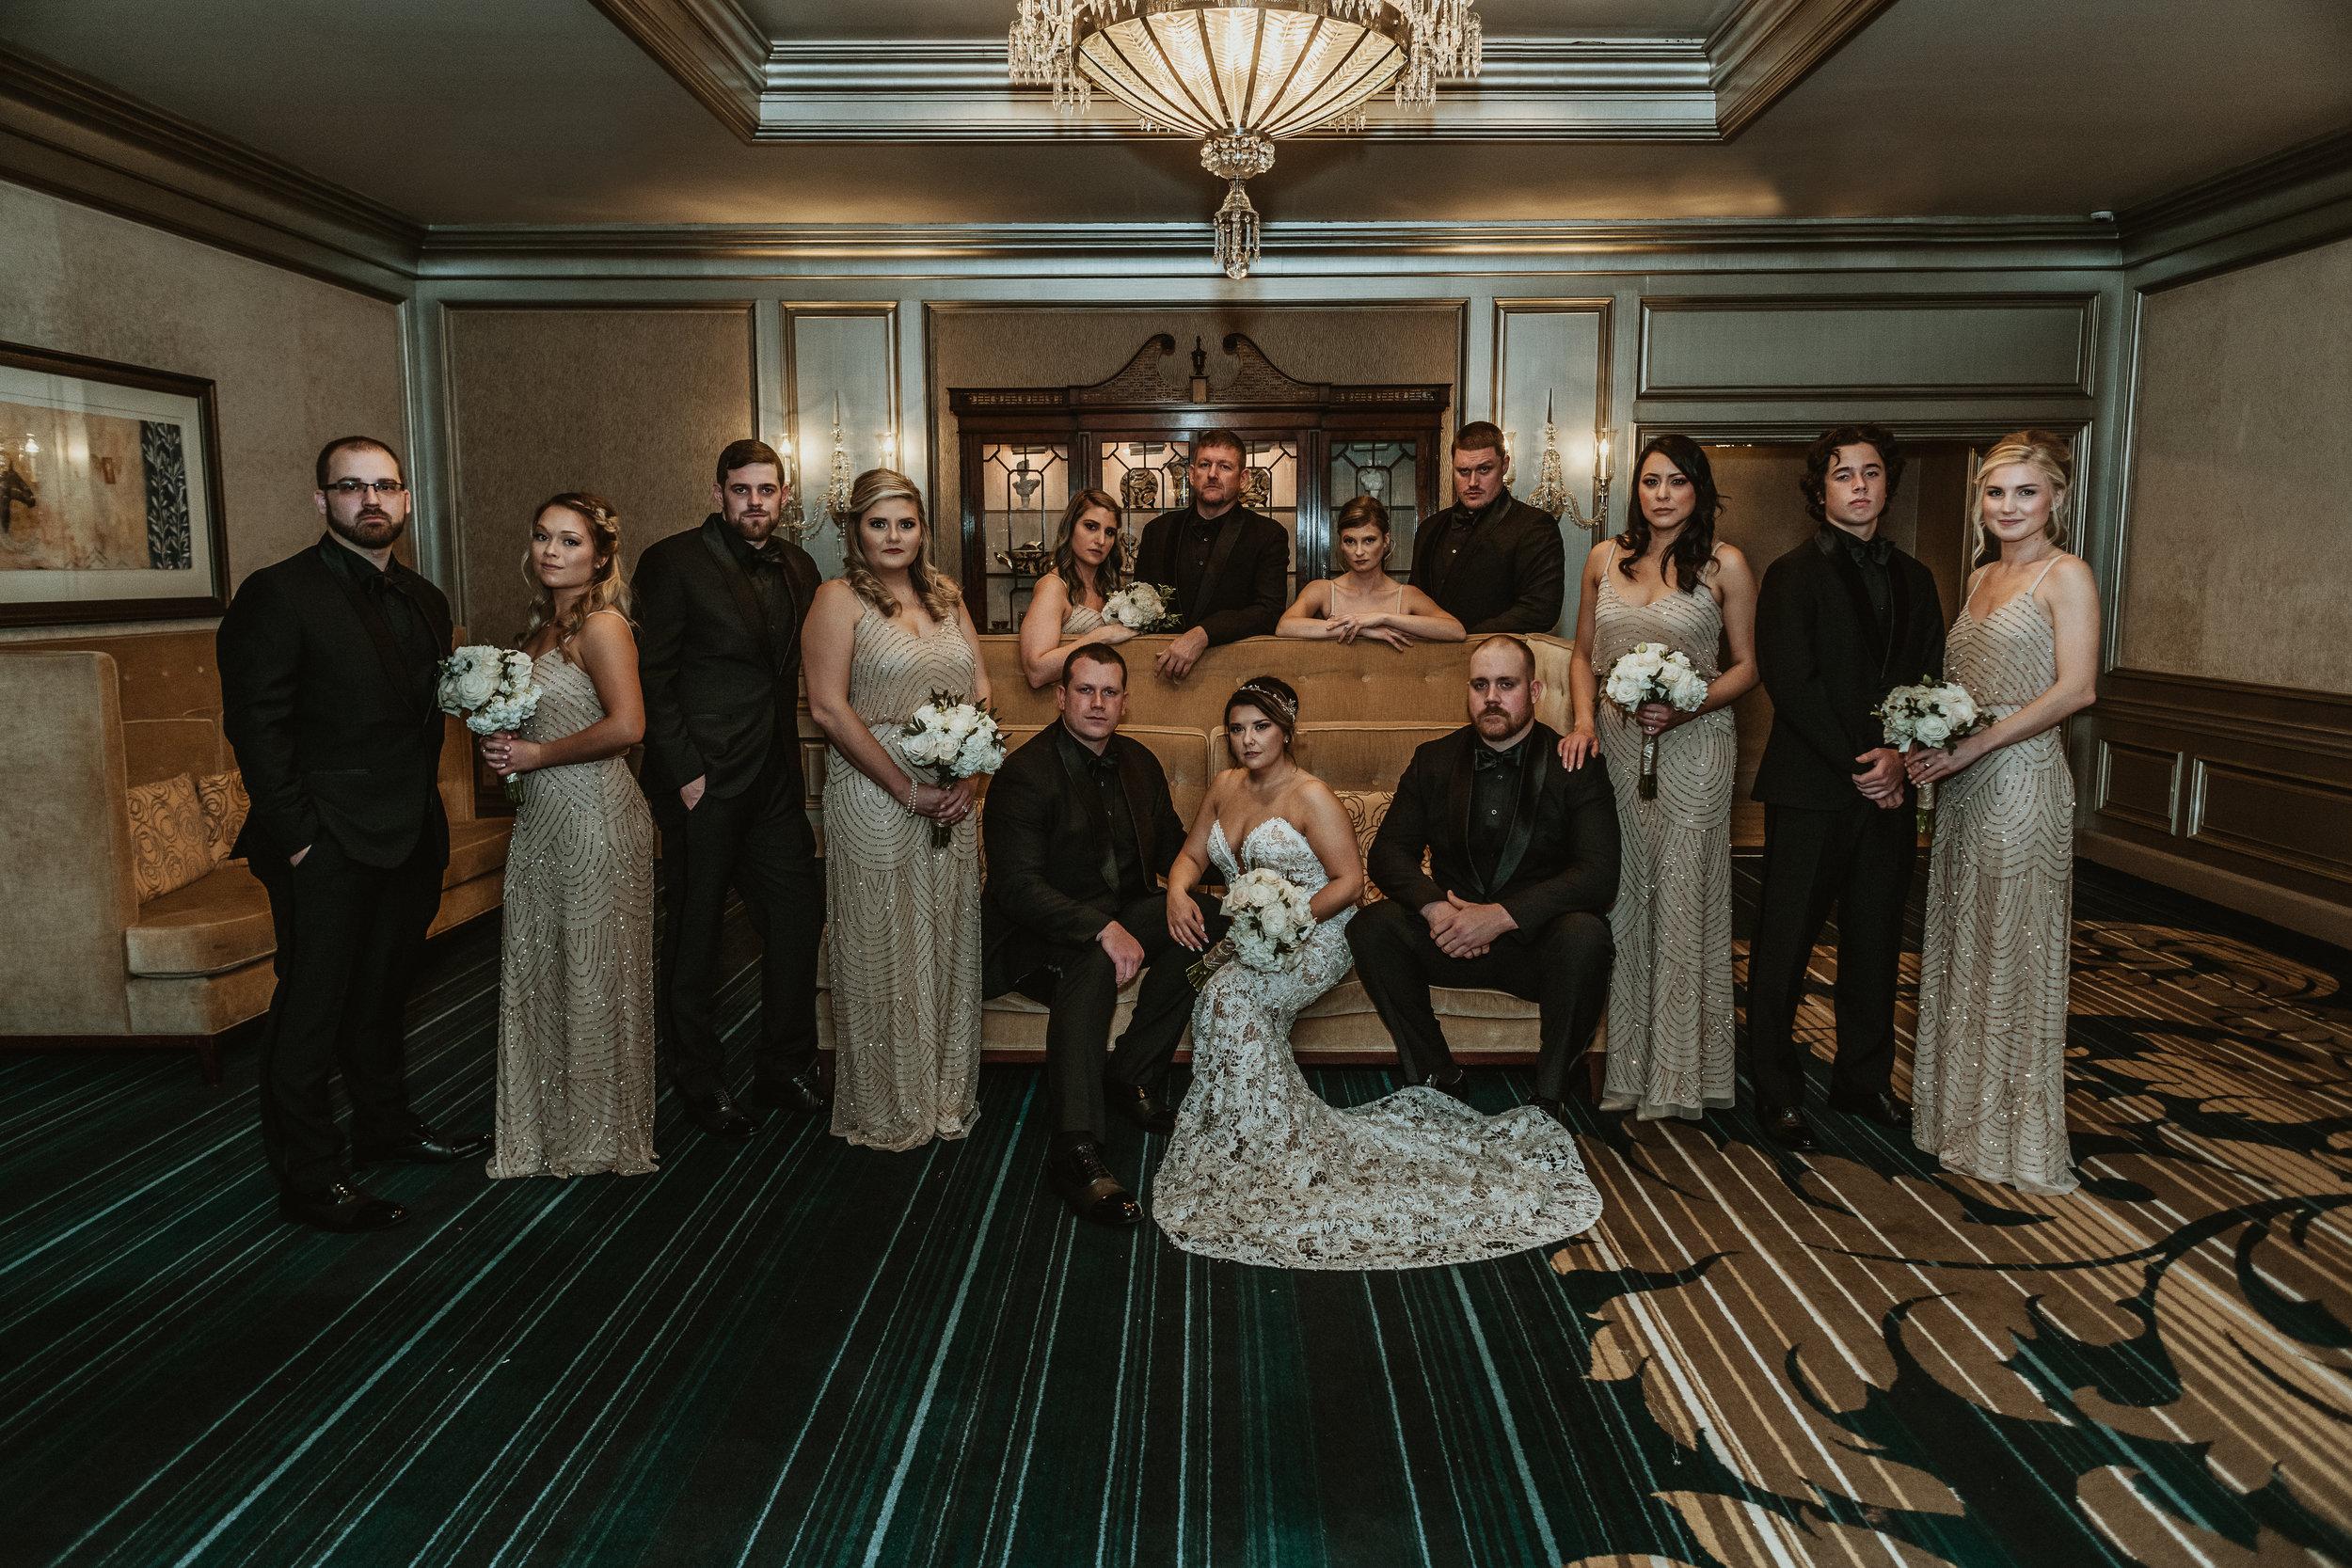 Classic Vintage Wedding   Ritz Carlton Atlanta, Georgia   Terry Farms Photography   Wedding Party Photo